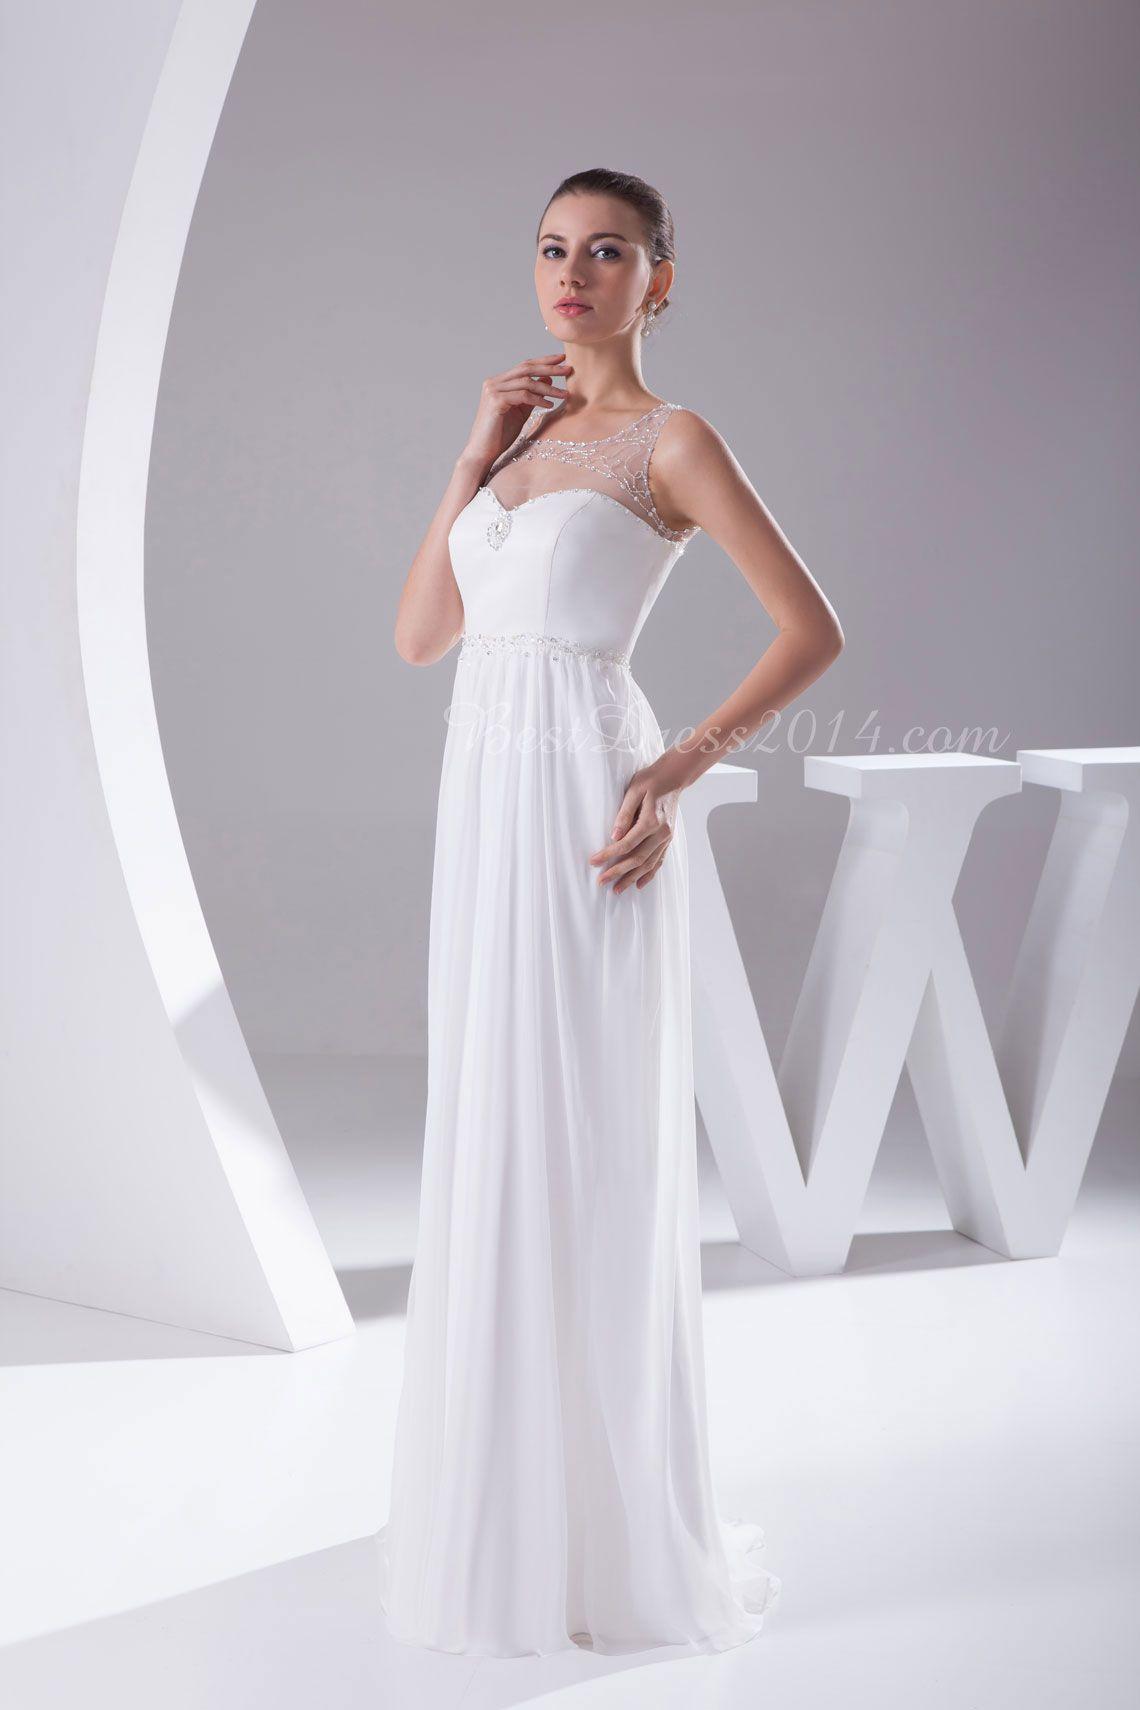 Wedding dress wedding dresses jessie james wedding ideas